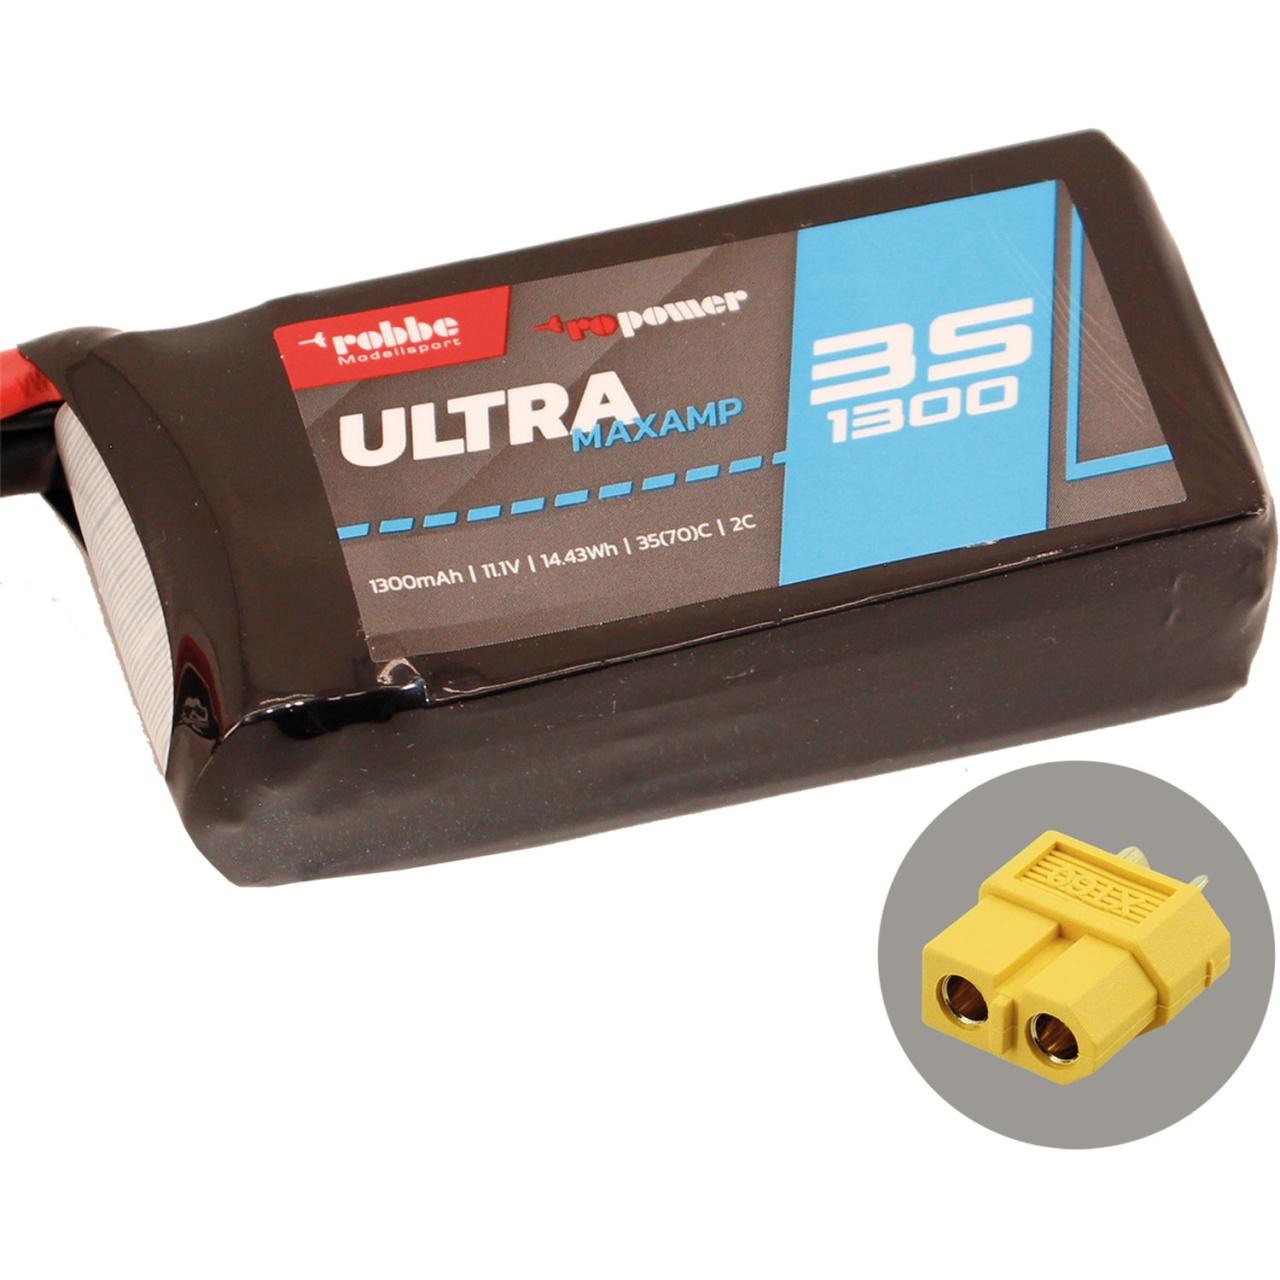 Ultra Max Amp 3S 1300mAh